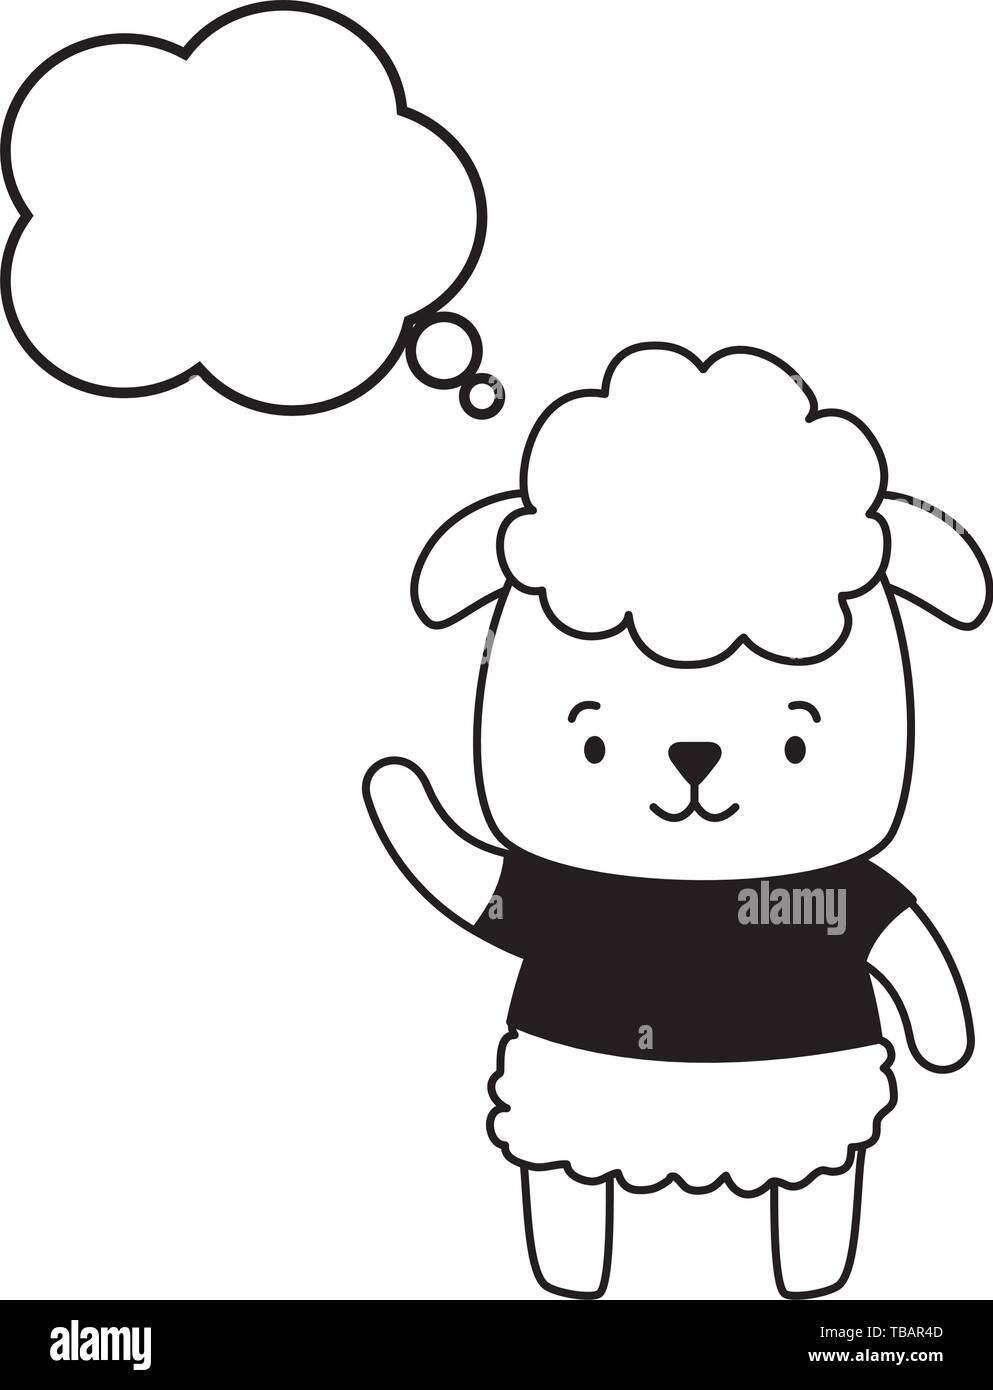 cute animal cartoon Stock Vector